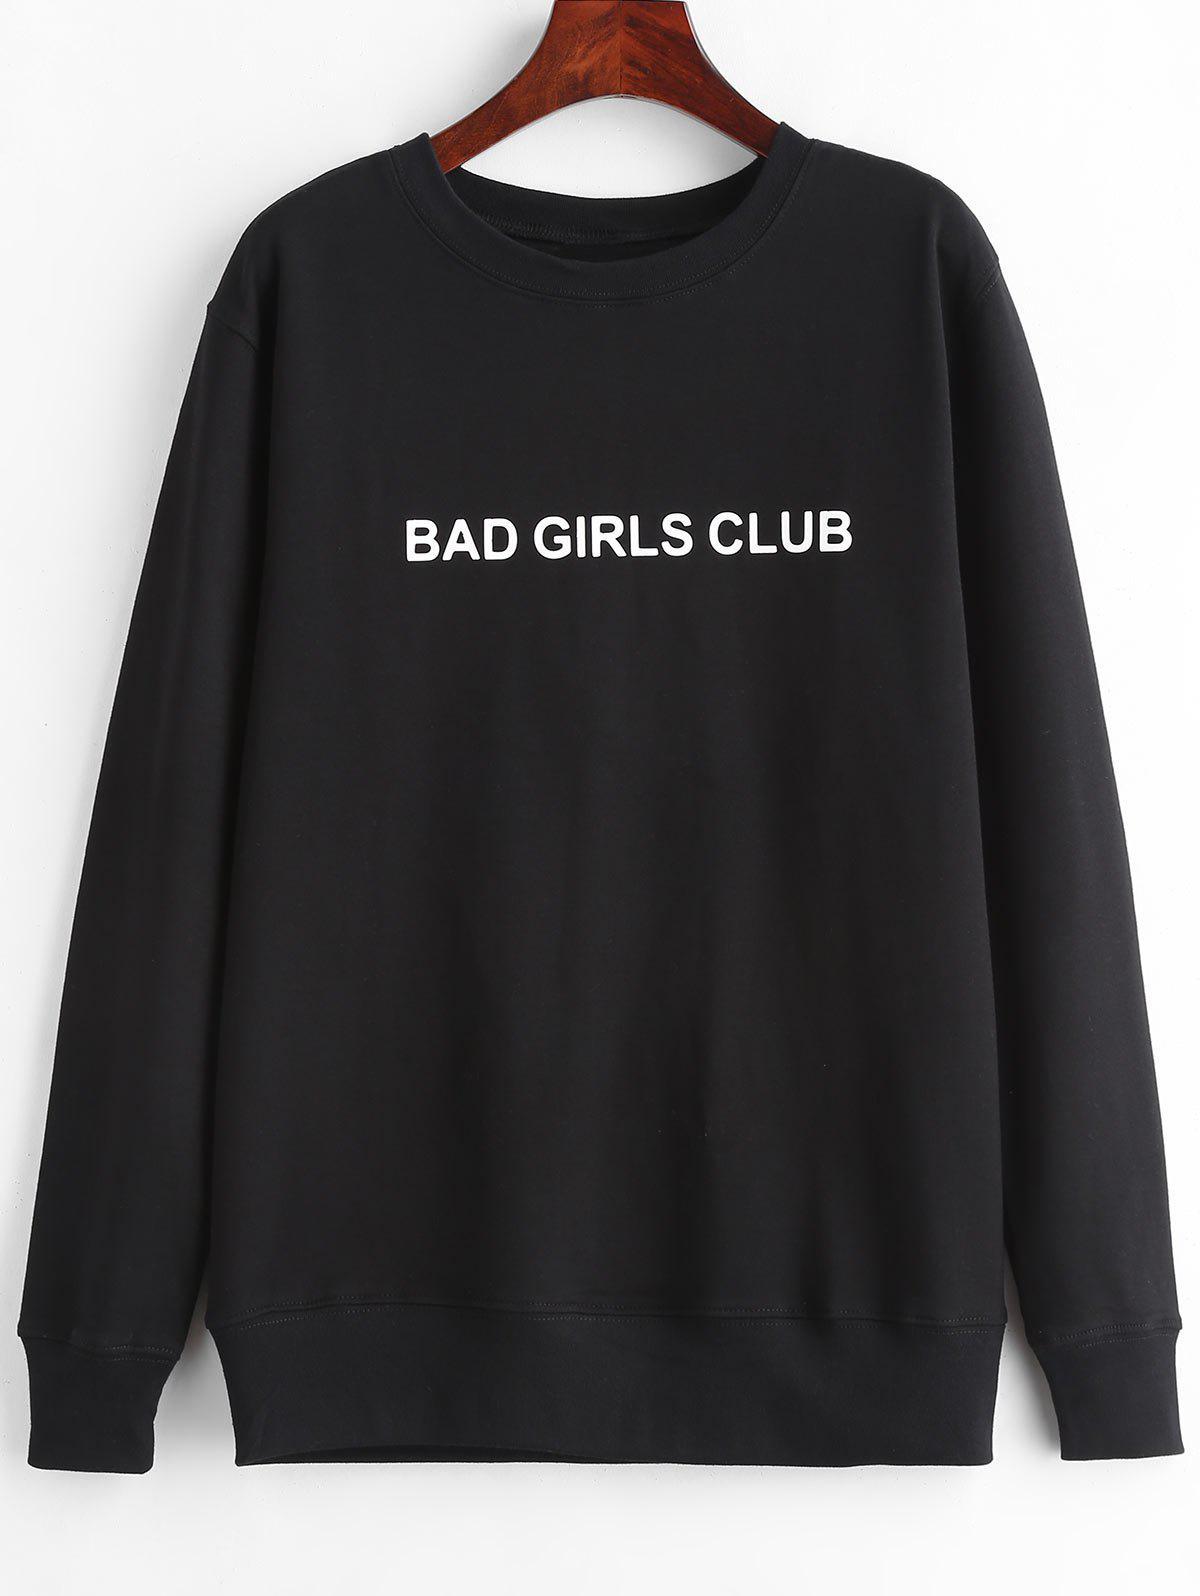 BAD GIRLS CLUB Graphiques Pull Sweat-shirt